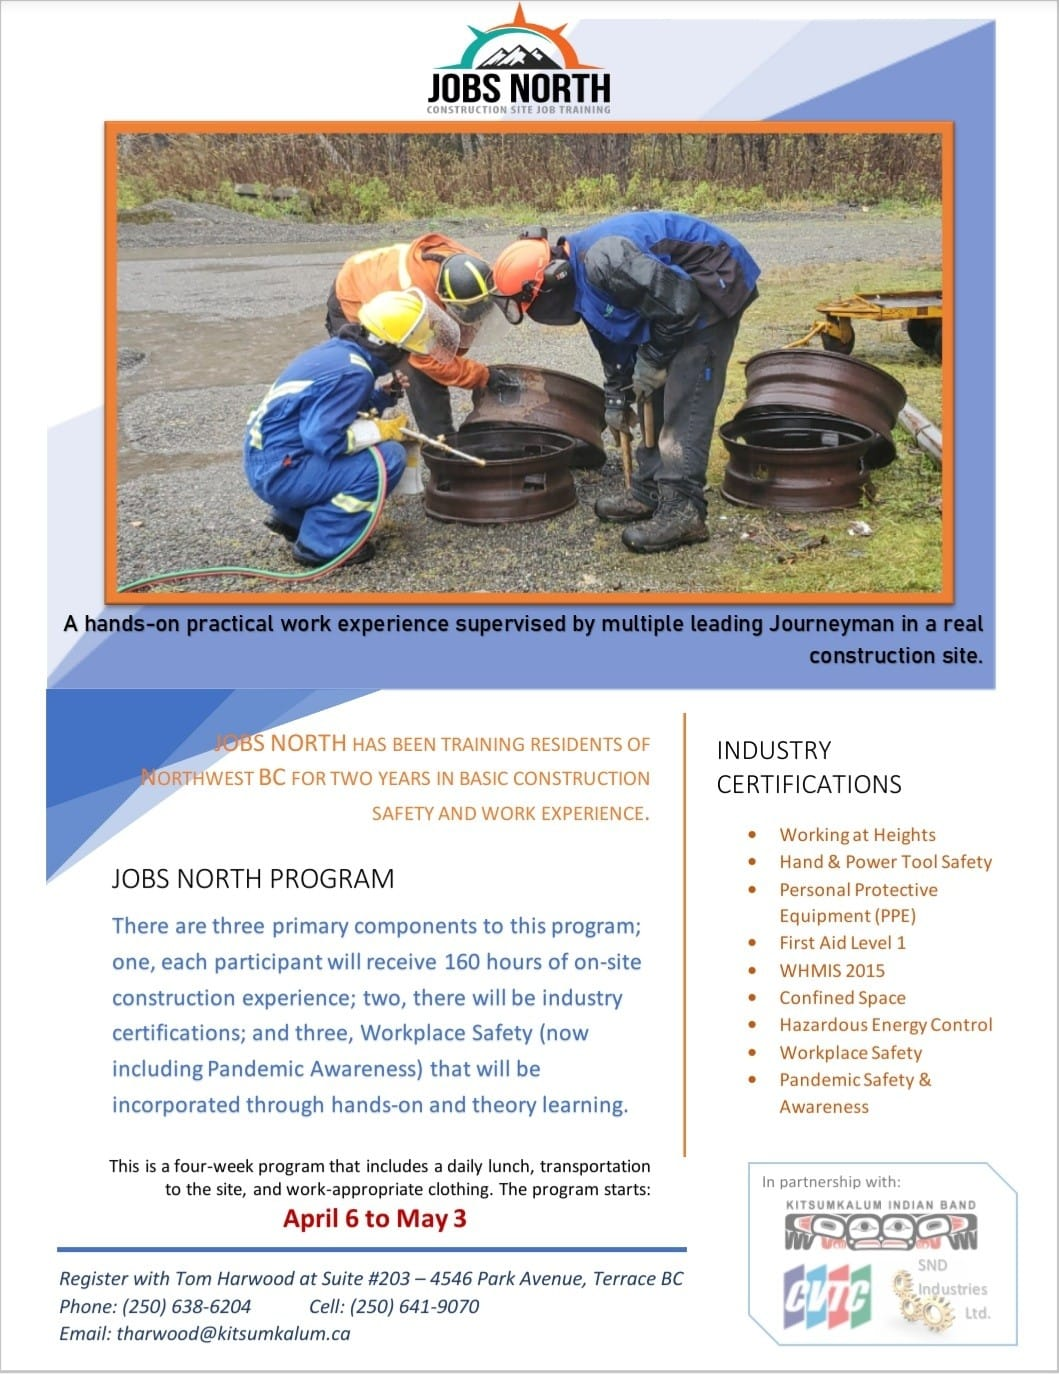 Jobs North Program